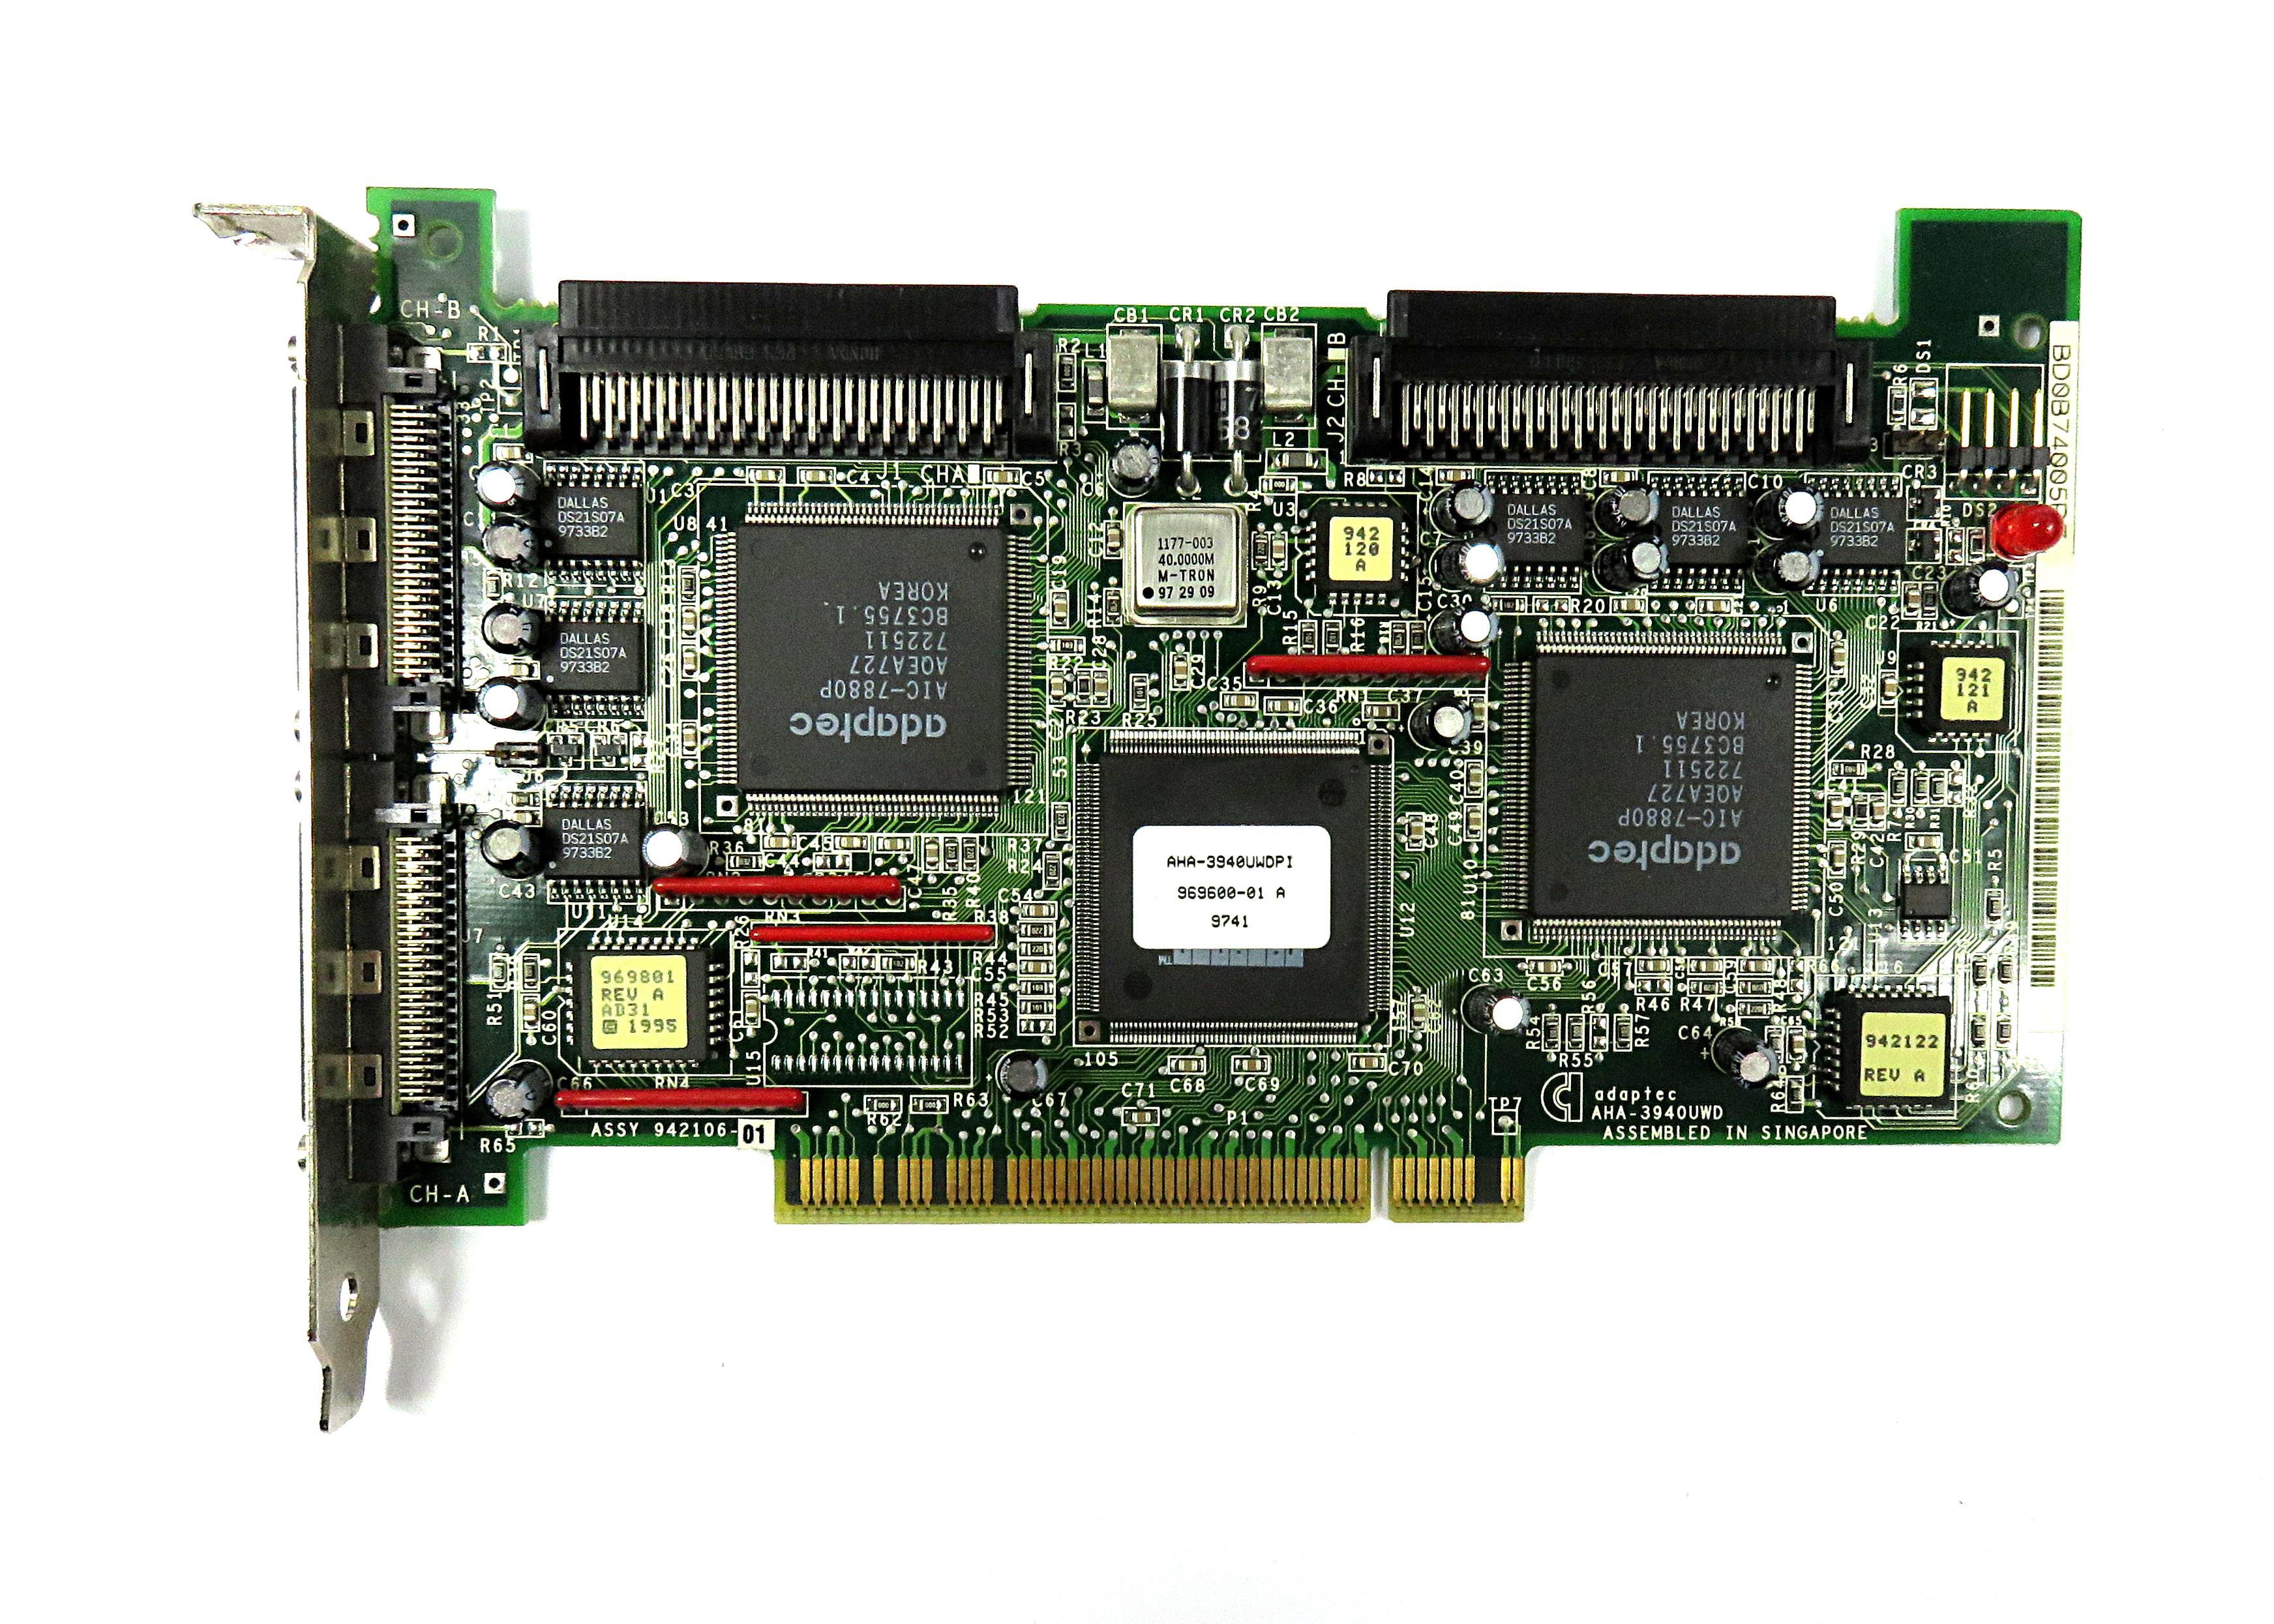 Adaptec AHA-3940UWD Dual-Channel Ultra-Wide SCSI PCI Card